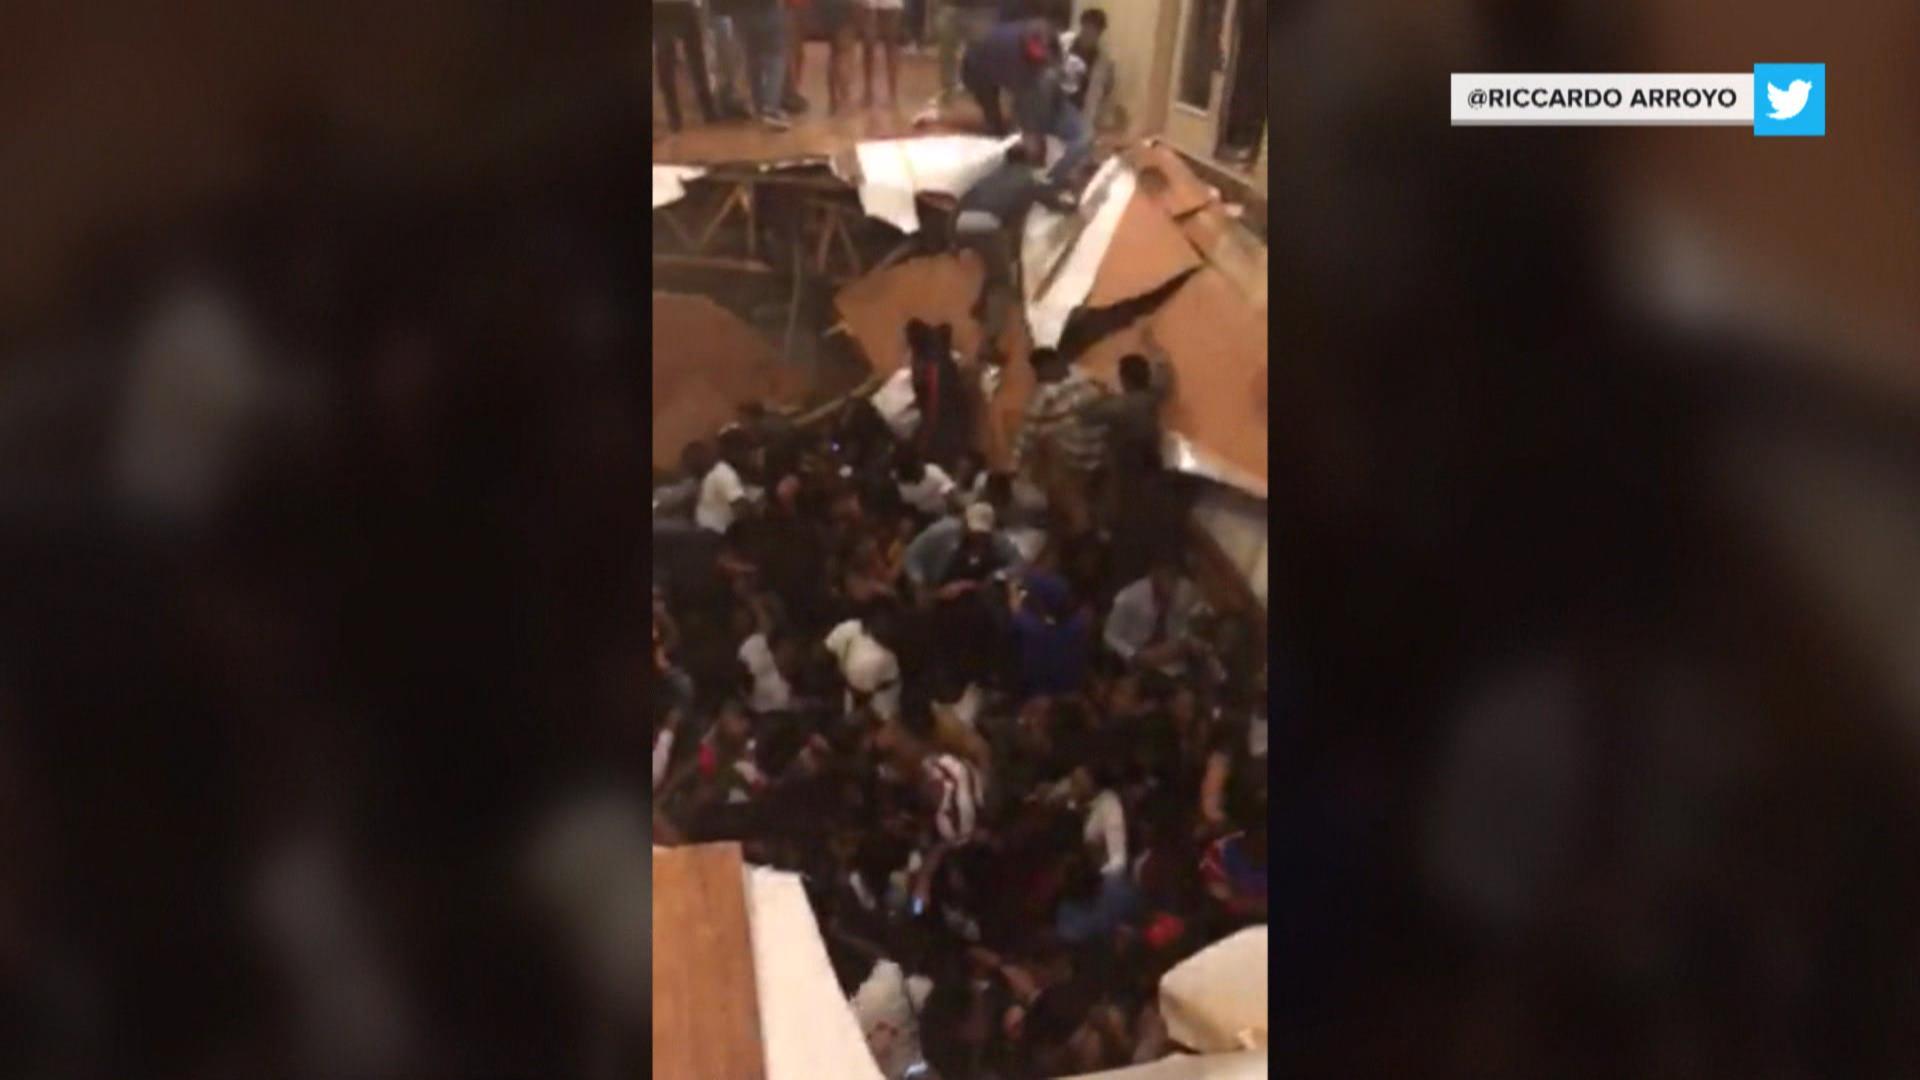 Dozens injured after floor collapses